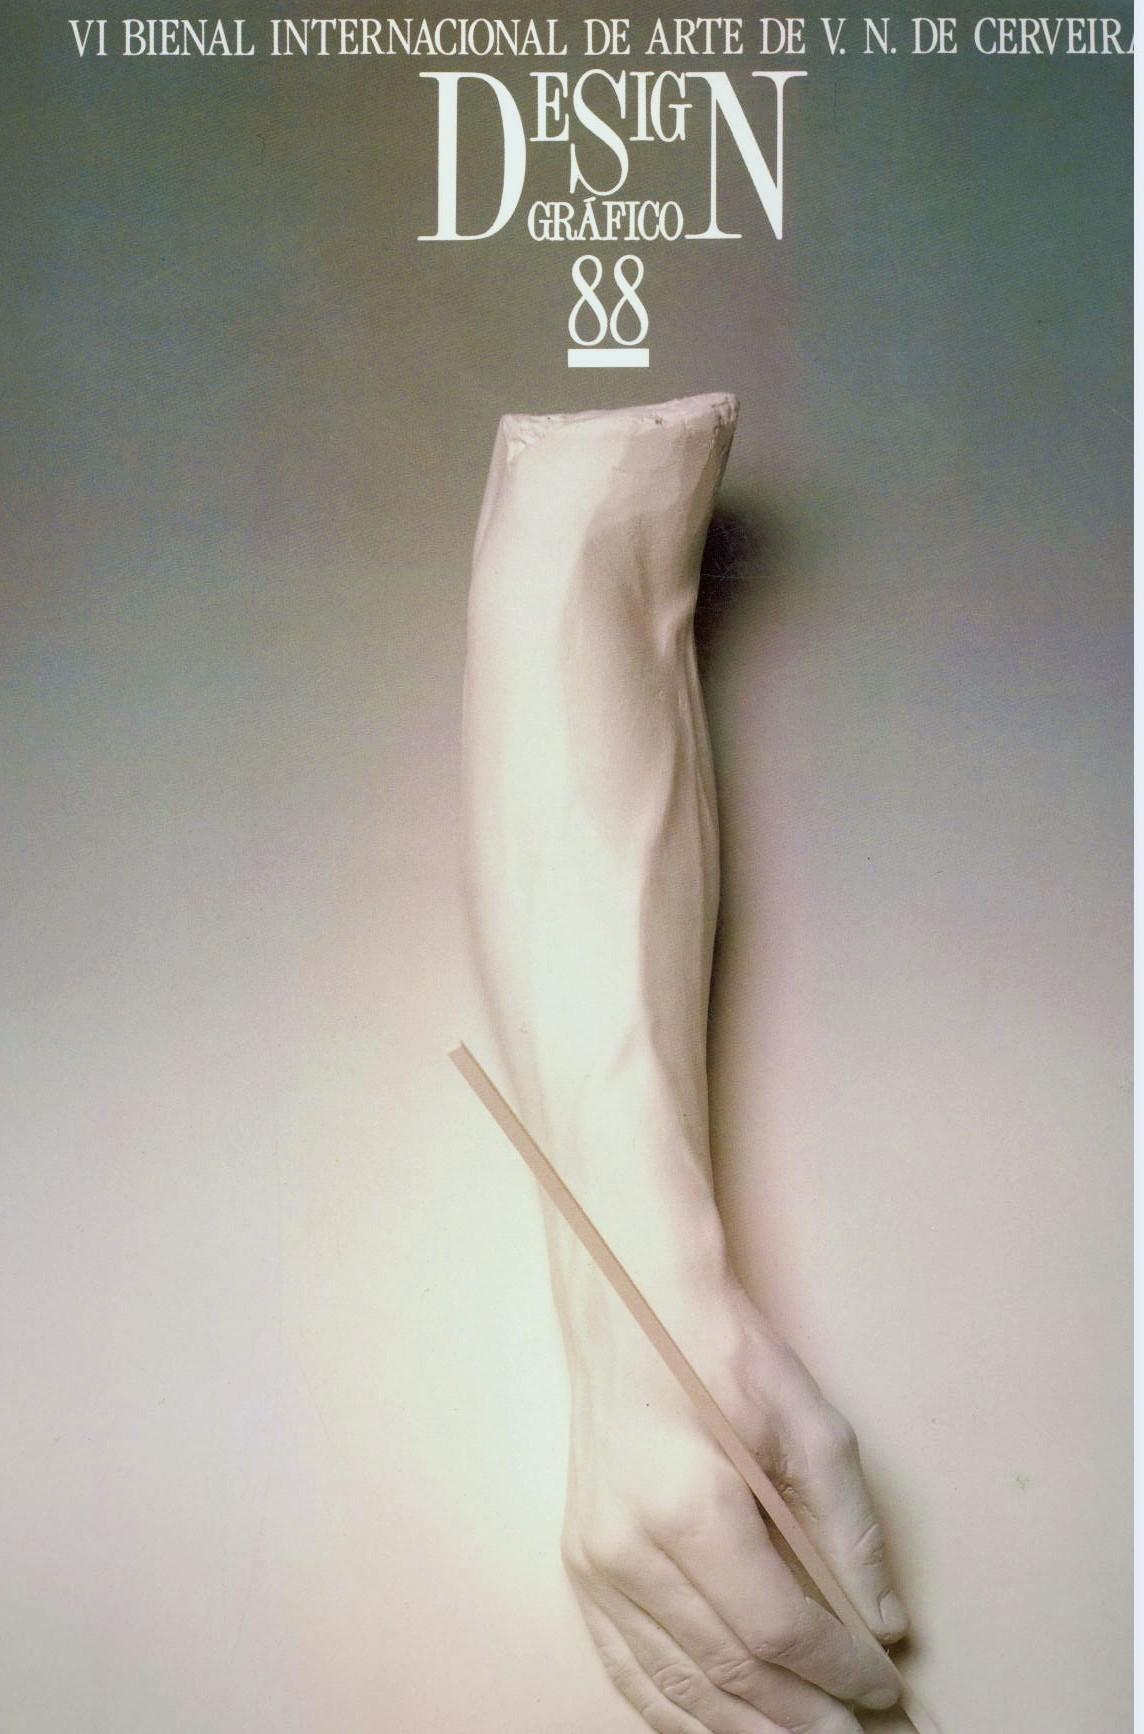 Catálogo Bienal VI